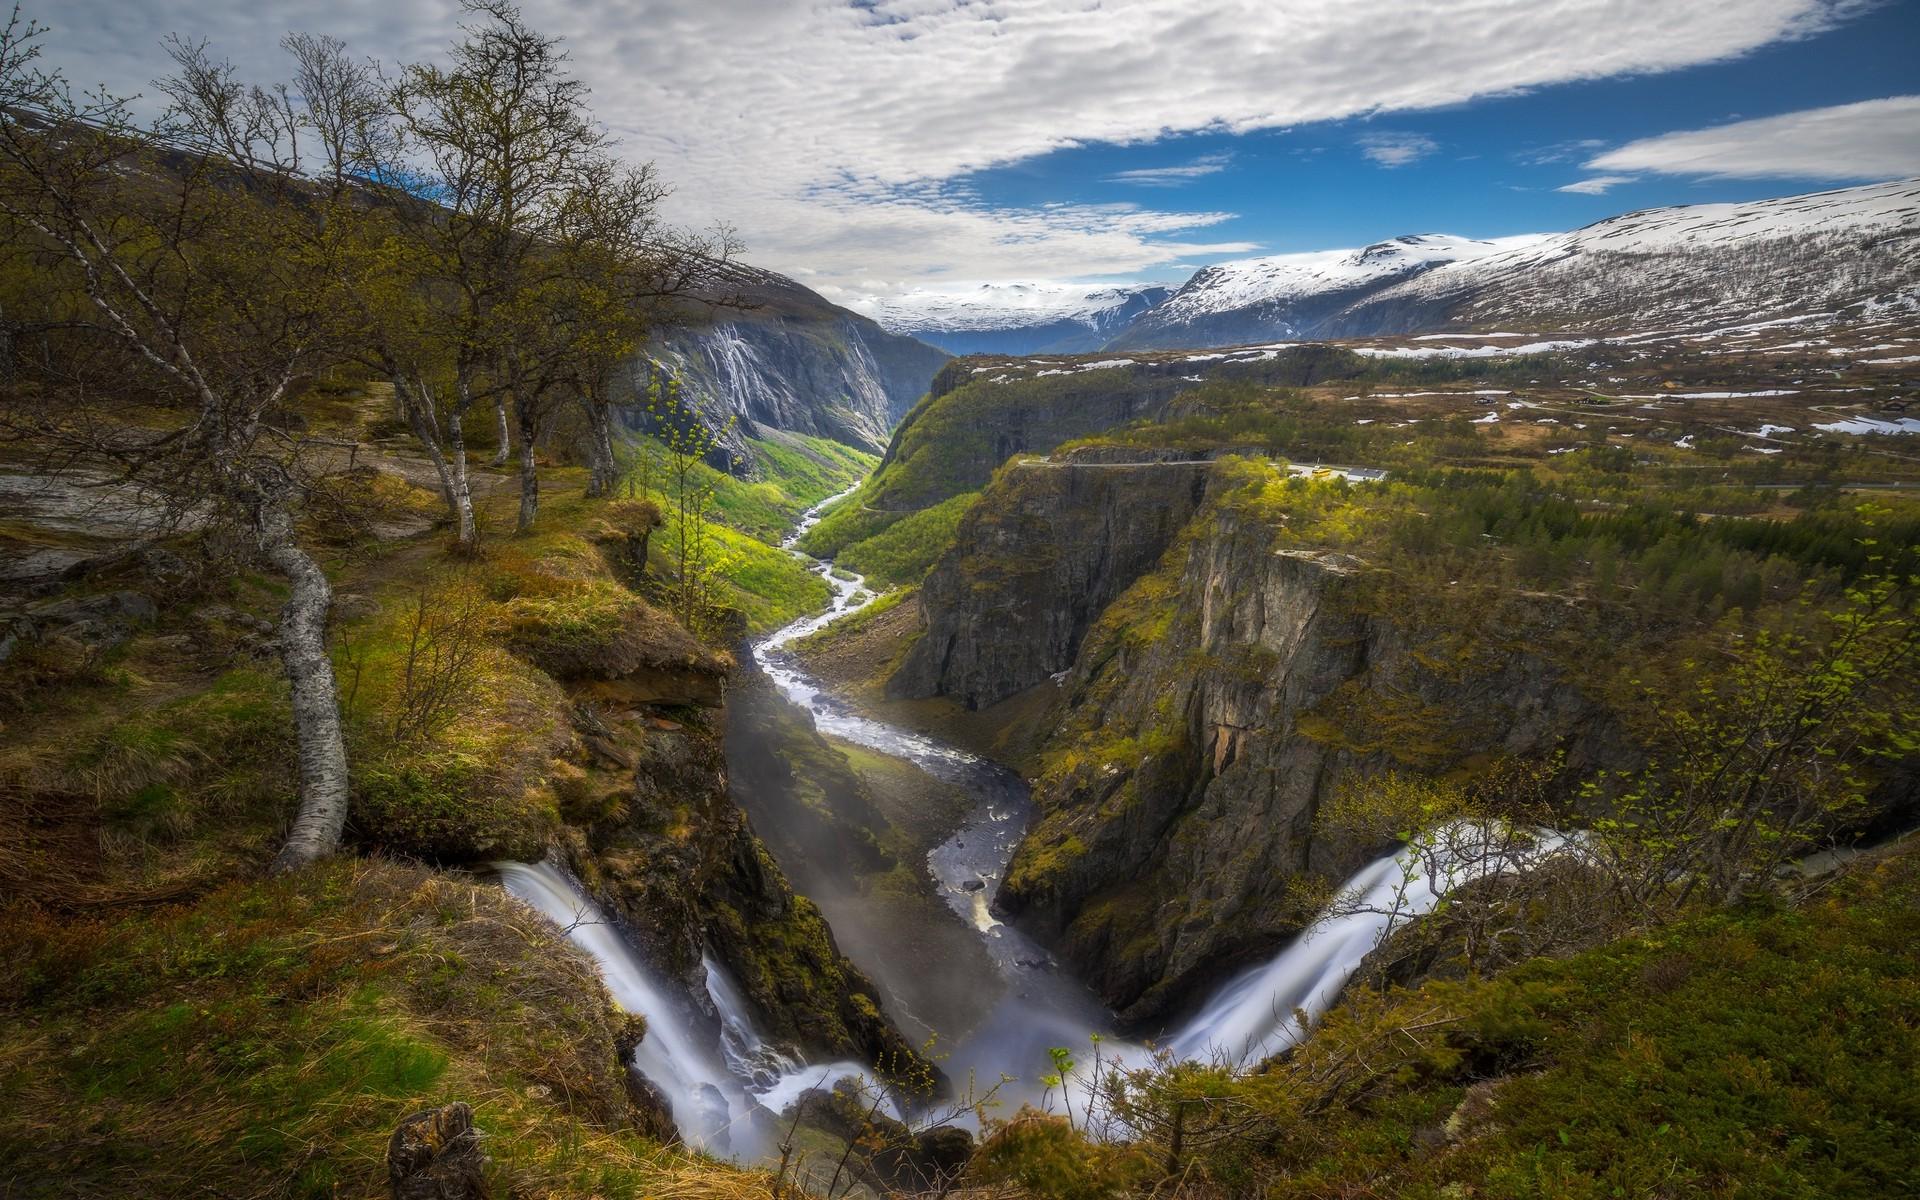 Fall Mountains Hd Desktop Wallpaper Nature Landscape Waterfall Canyon River Norway Trees